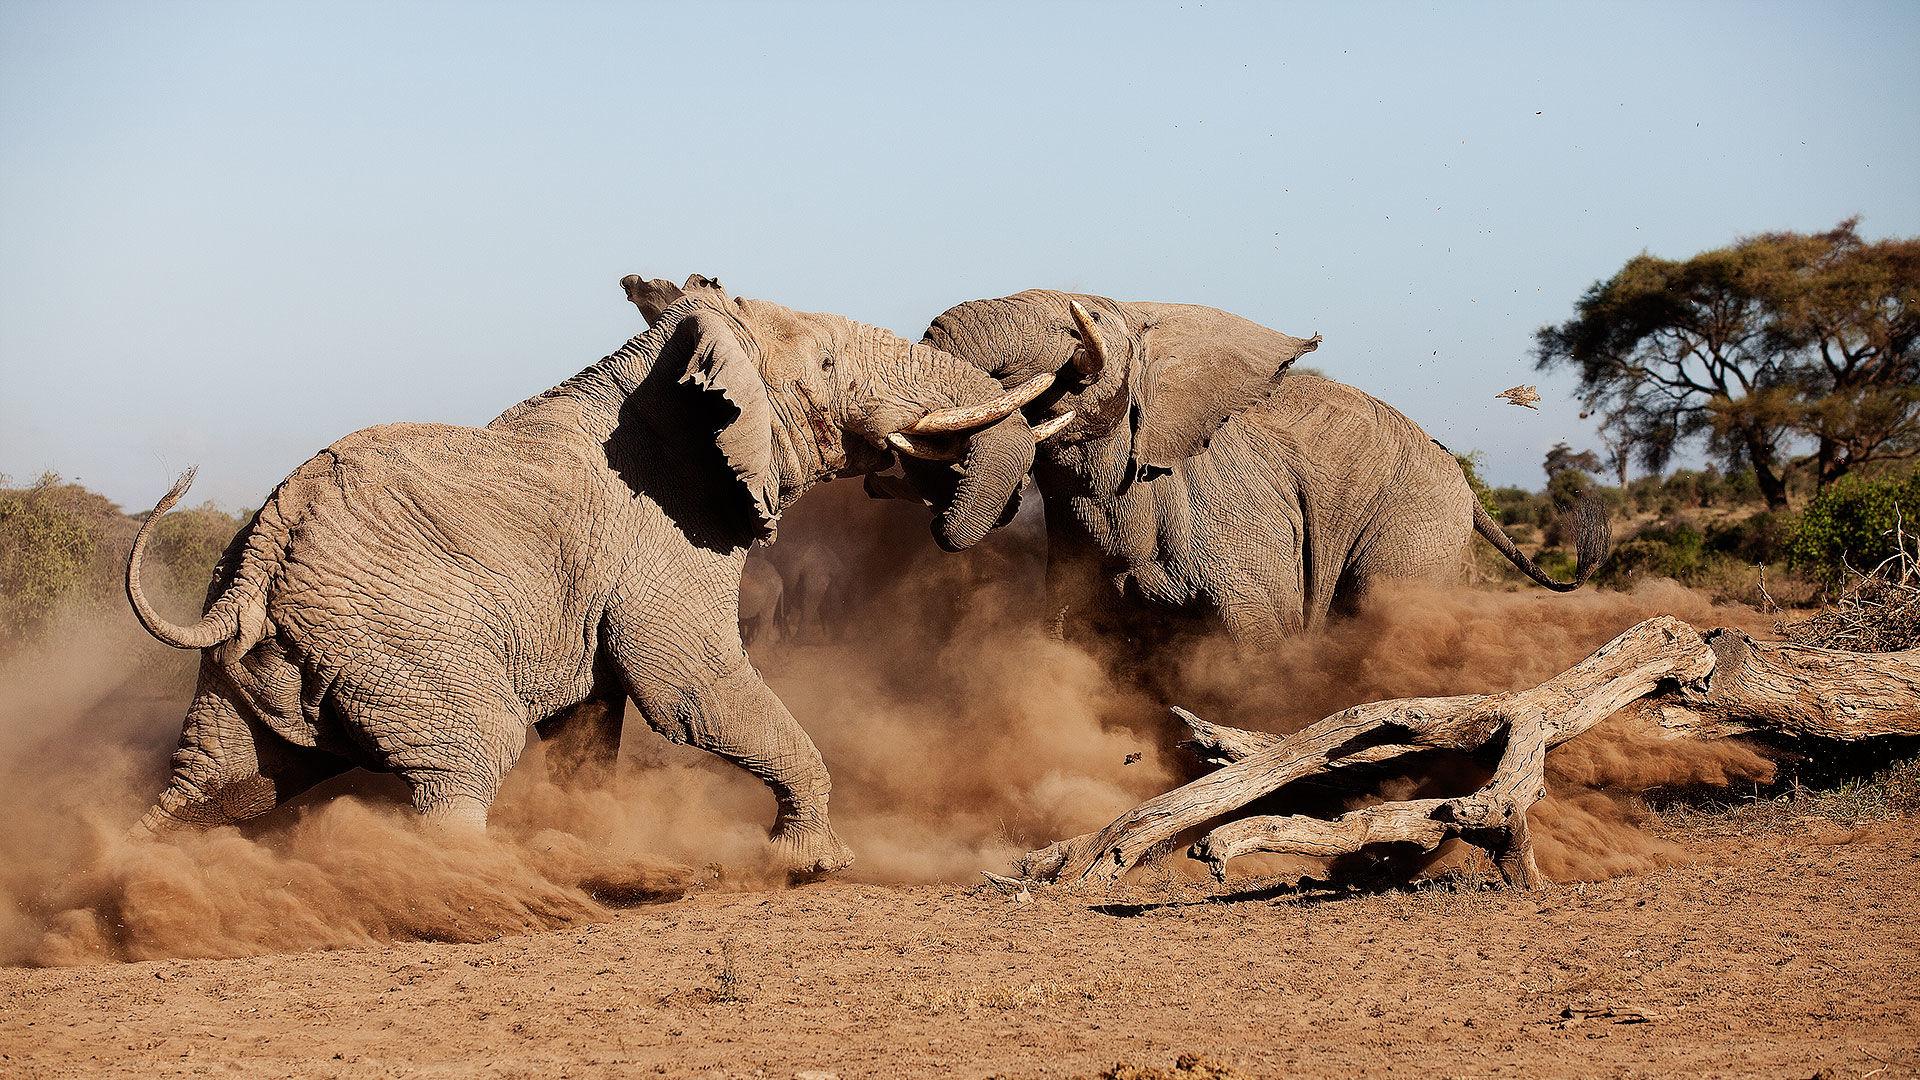 Privéreis Kenia hoogtepunten safari - 10 dagen | Matoke Tours